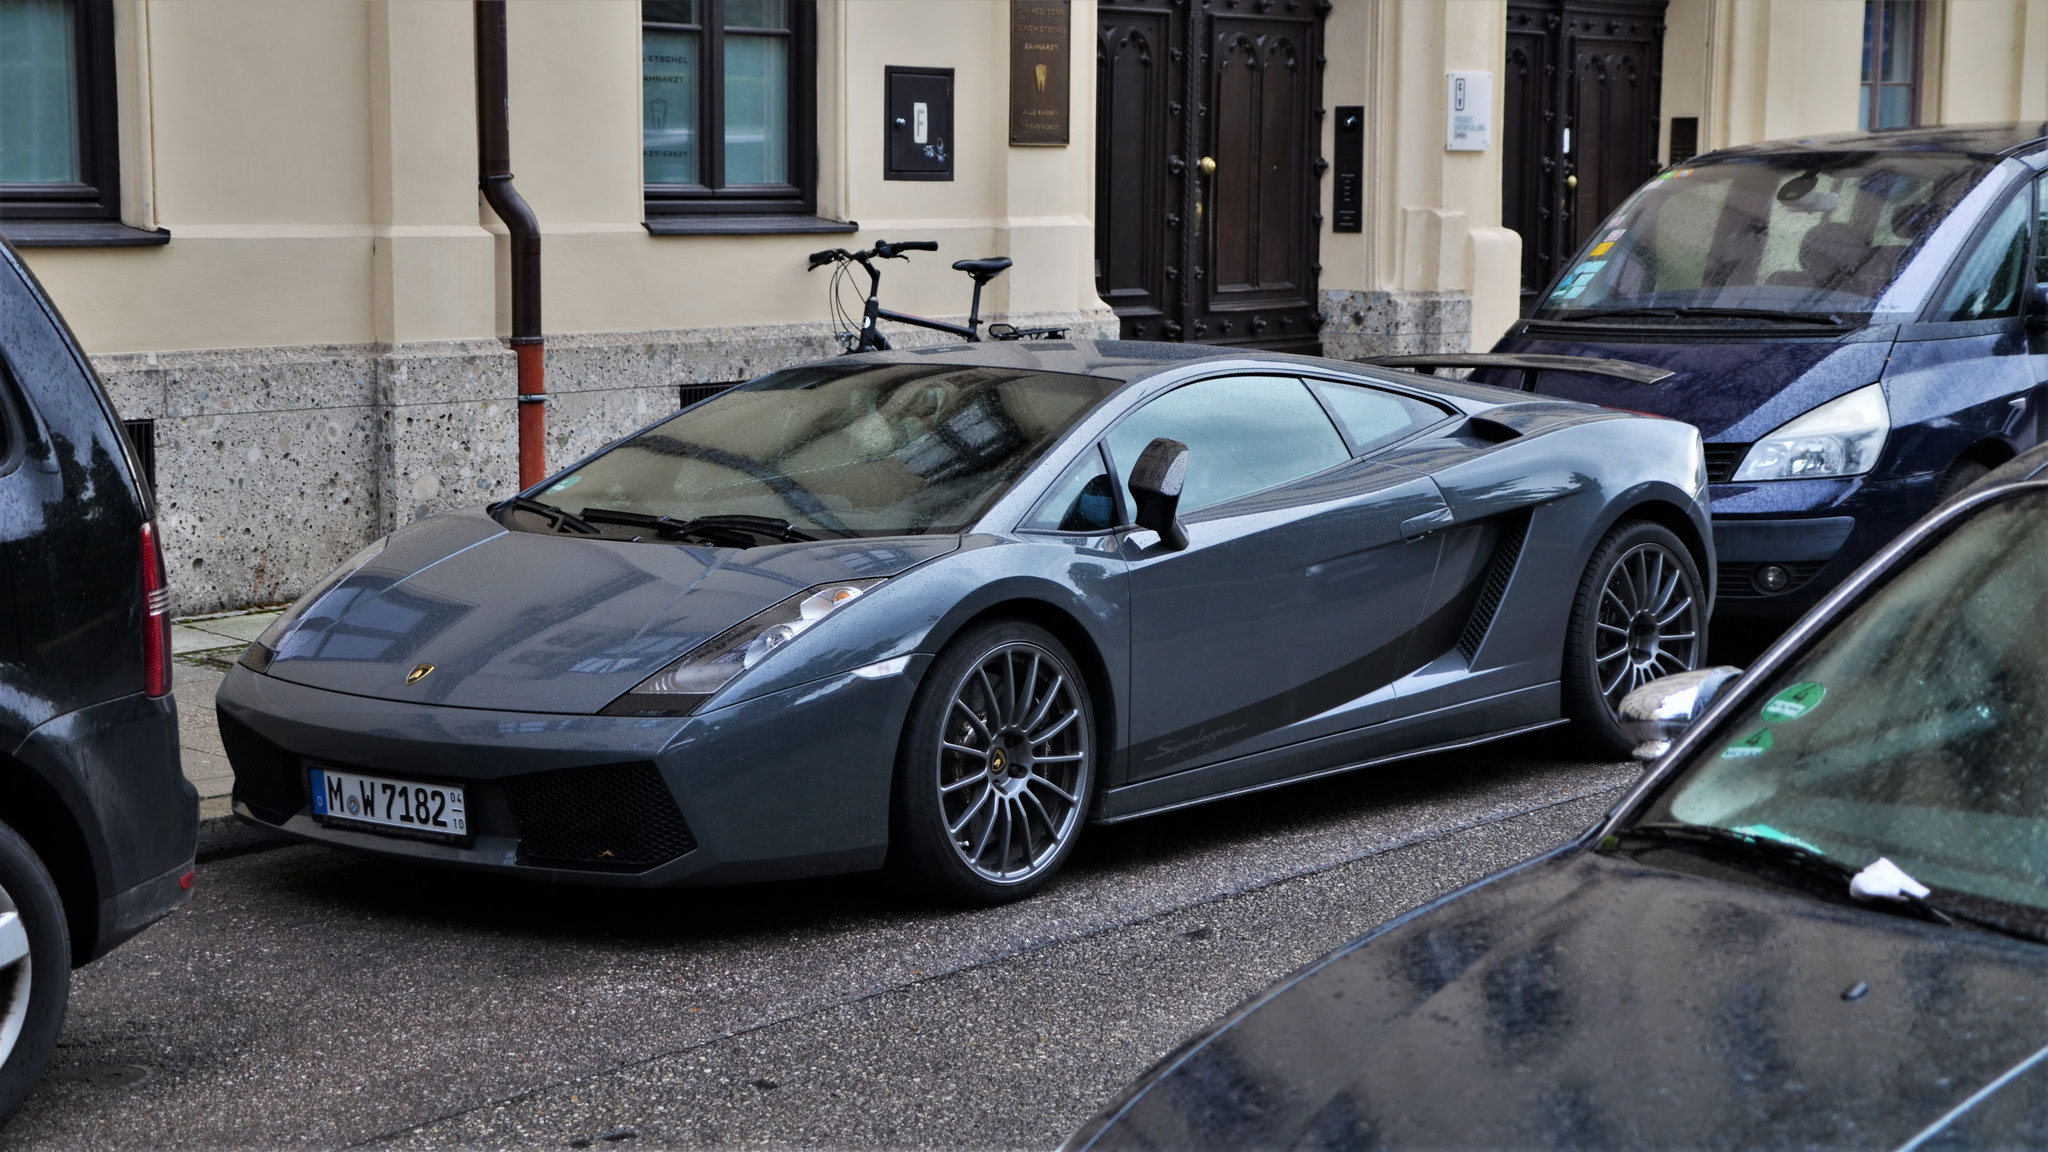 Lamborghini Gallardo Superleggera - M-W-7182